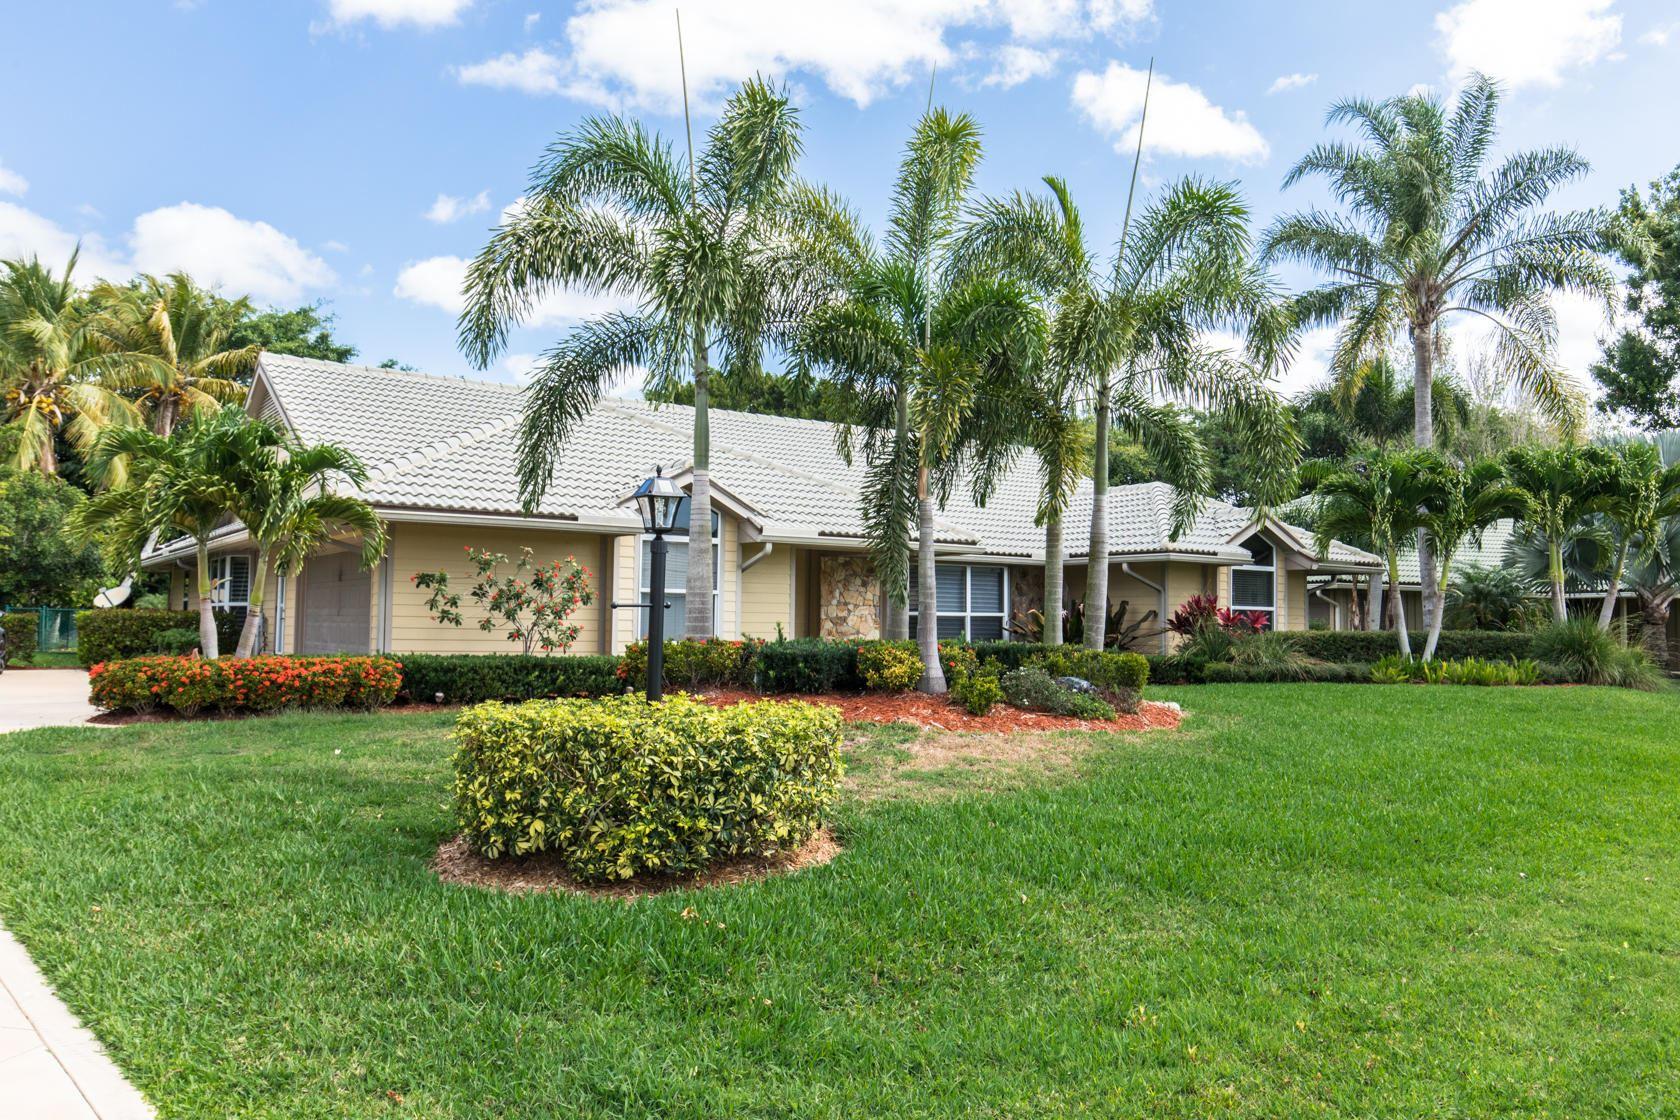 Photo of 14 Dunbar Road, Palm Beach Gardens, FL 33418 (MLS # RX-10711840)